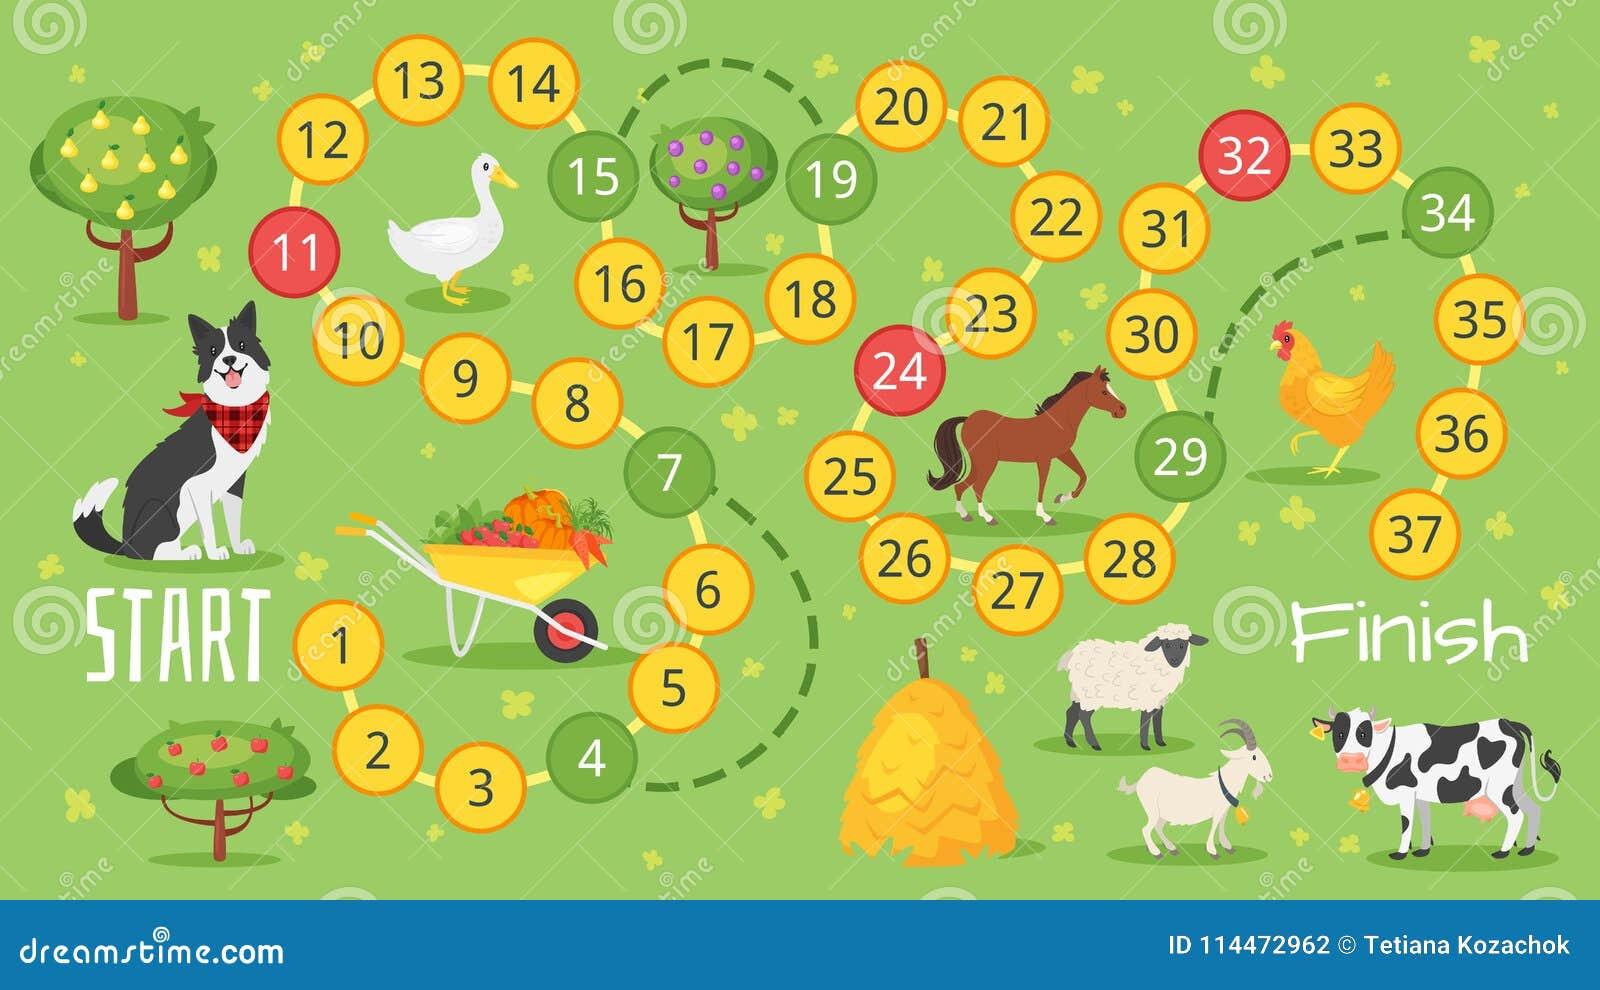 Board Game Template | Farm Board Game Template Stock Vector Illustration Of Children